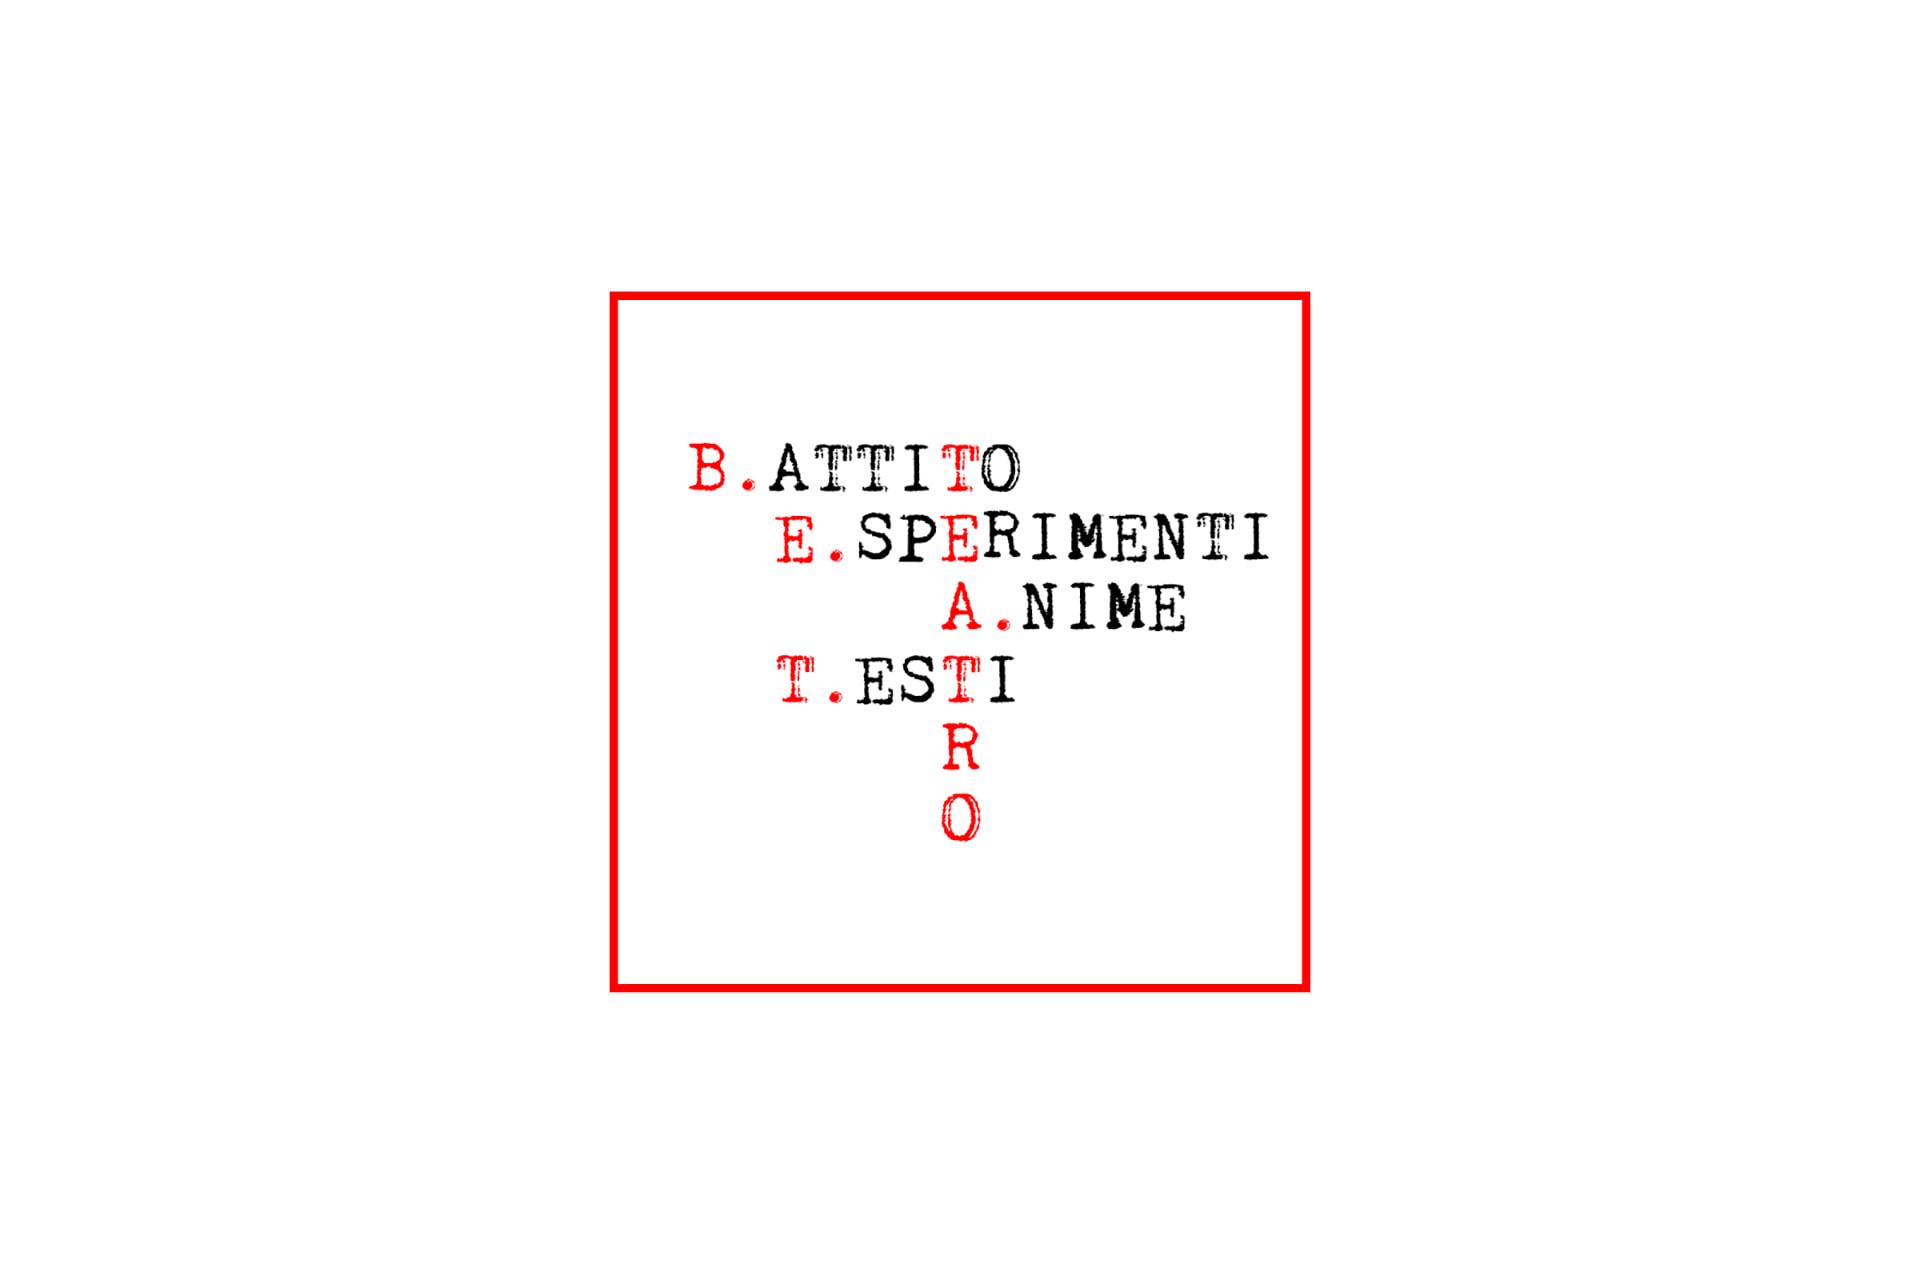 Logo alternativo B.E.A.T.